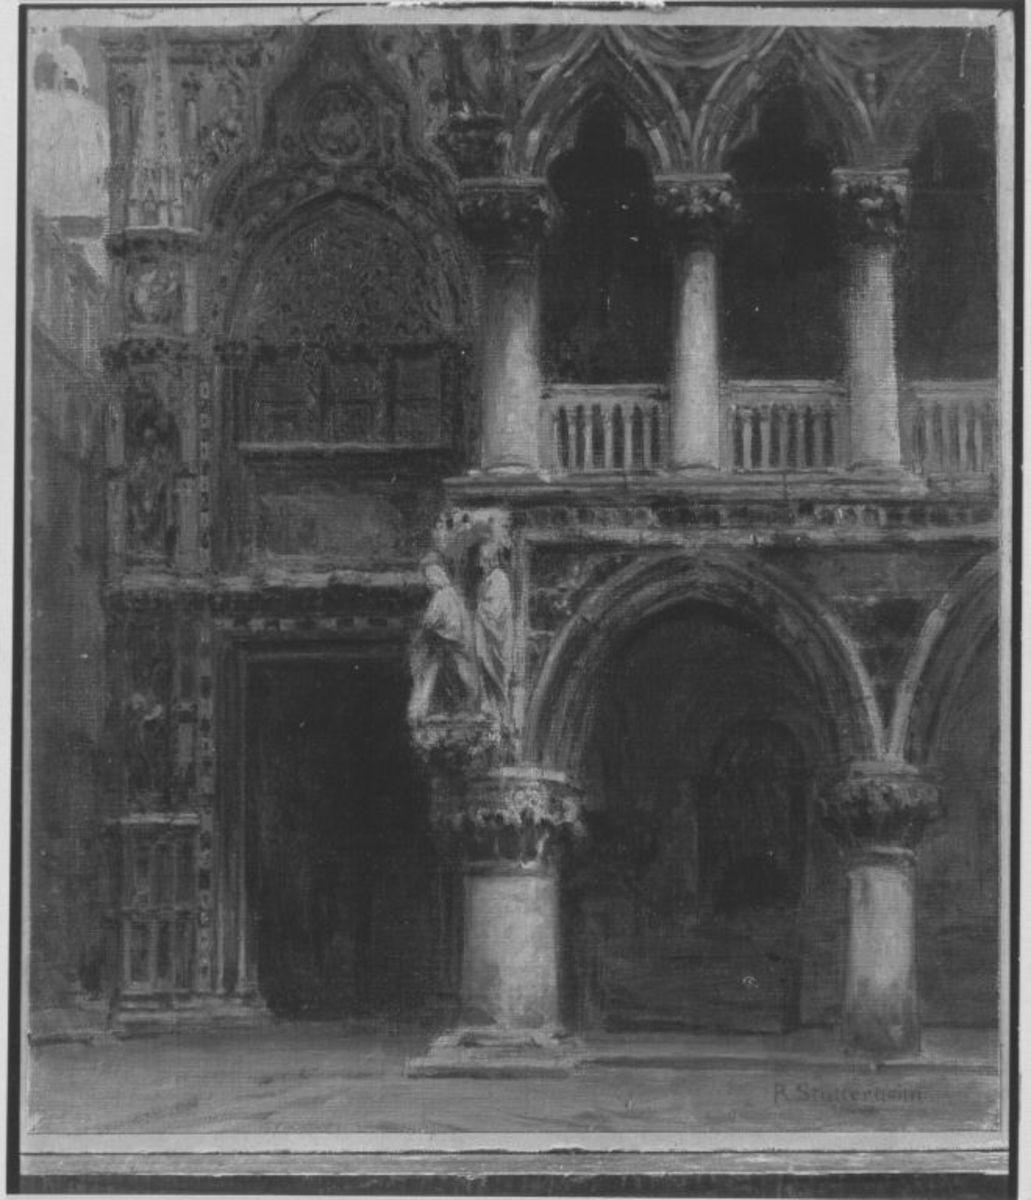 Eingang zum Dogenpalast